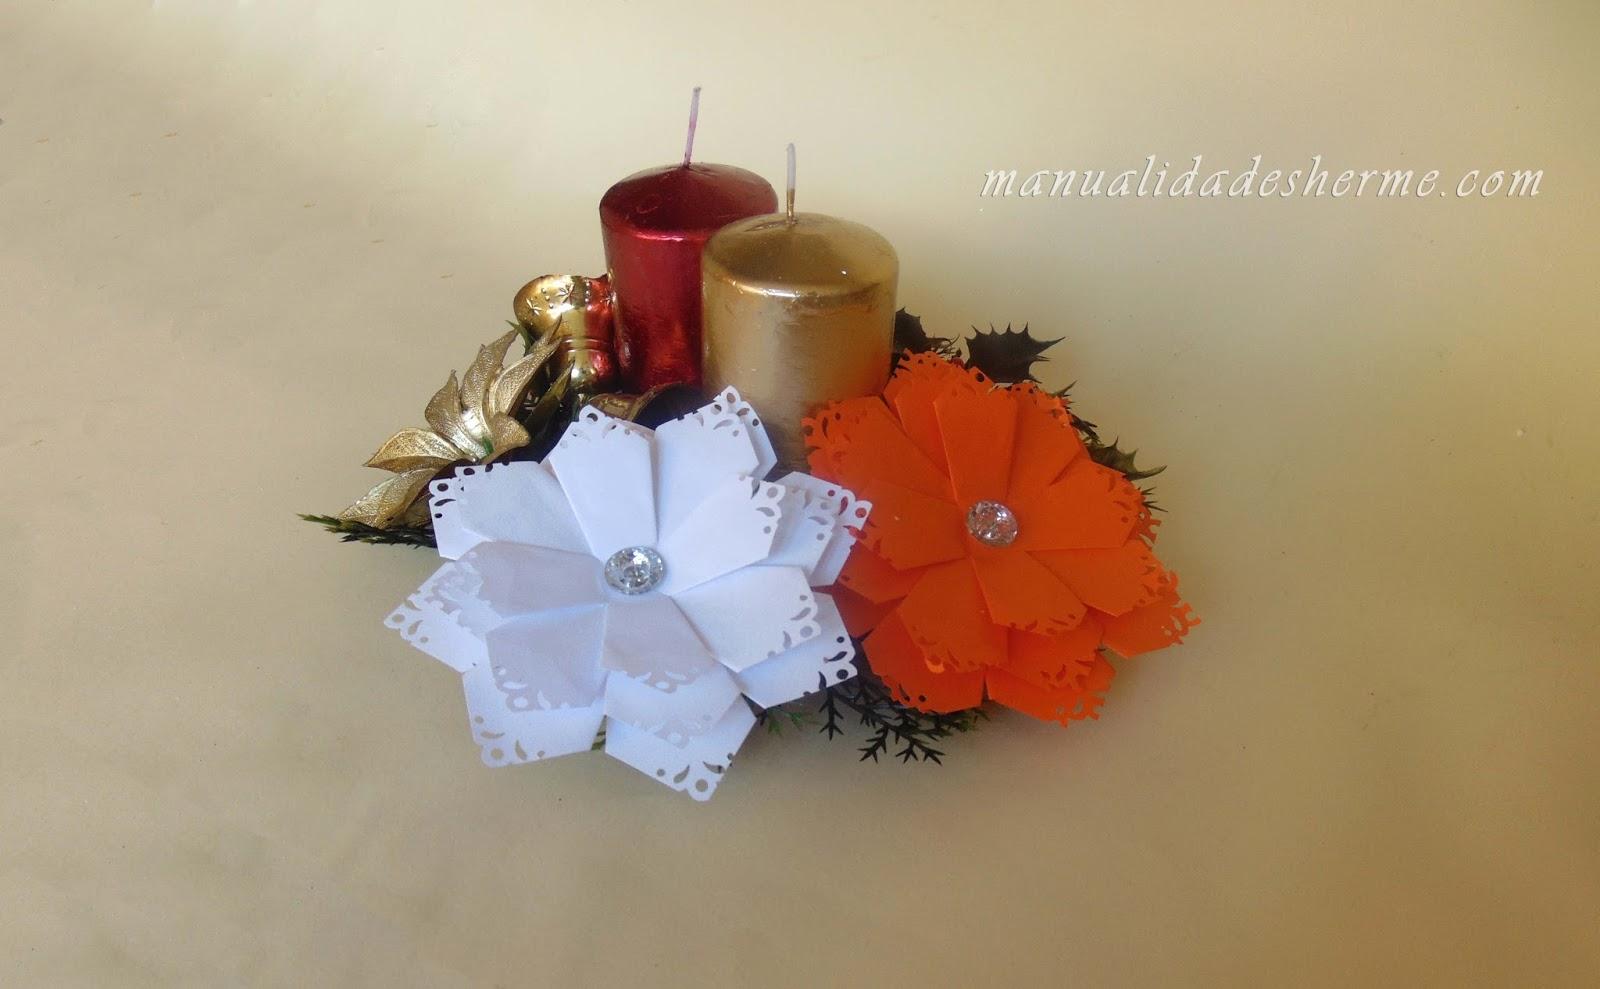 Manualidades herme como hacer flores para navidad - Manualidades paso a paso para navidad ...